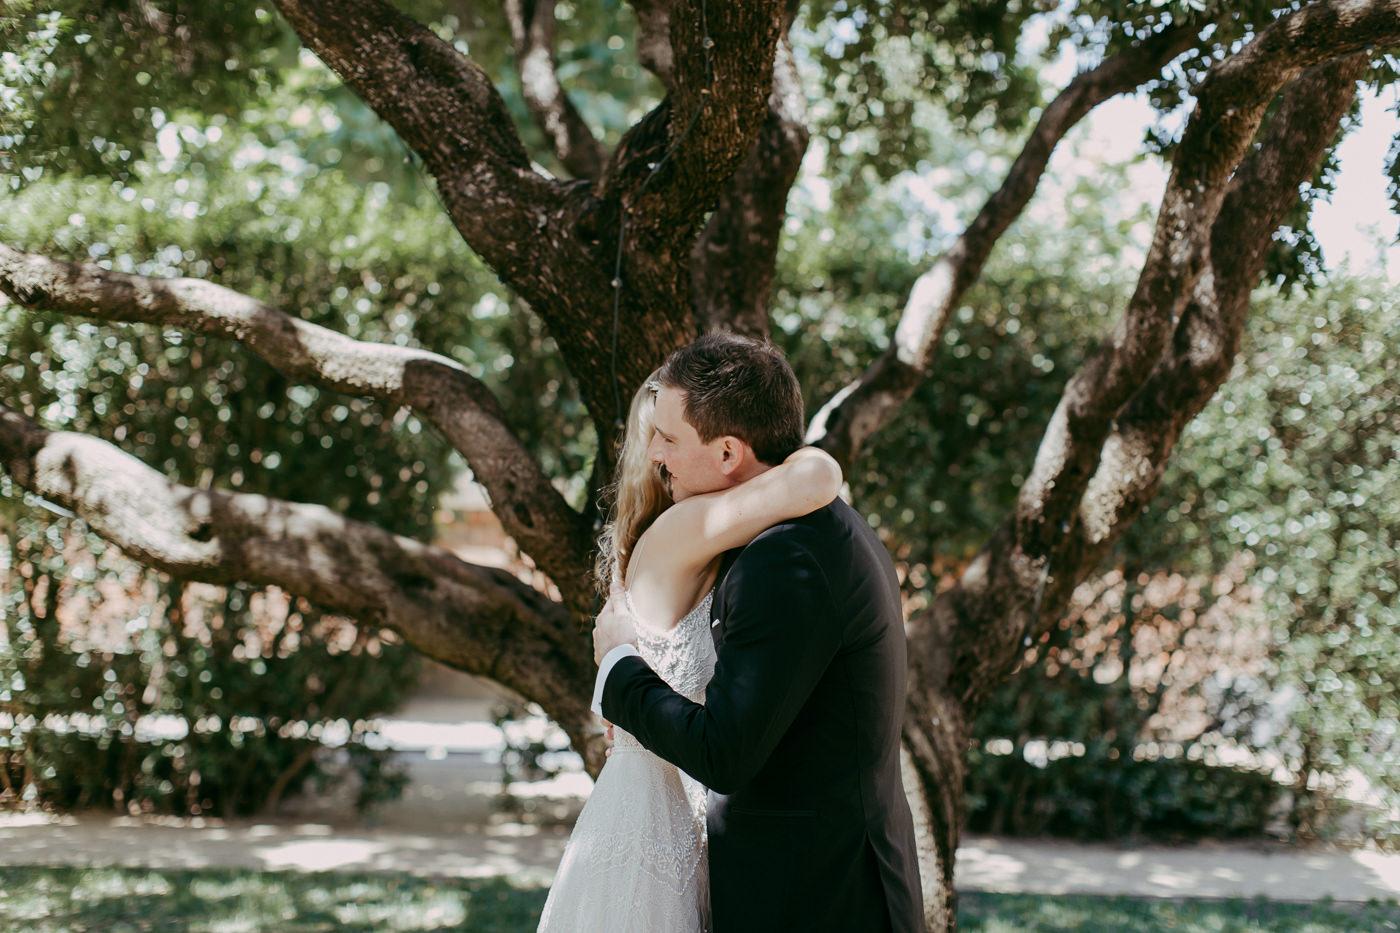 Anthony & Eliet - Wagga Wagga Wedding - Country NSW - Samantha Heather Photography-36.jpg